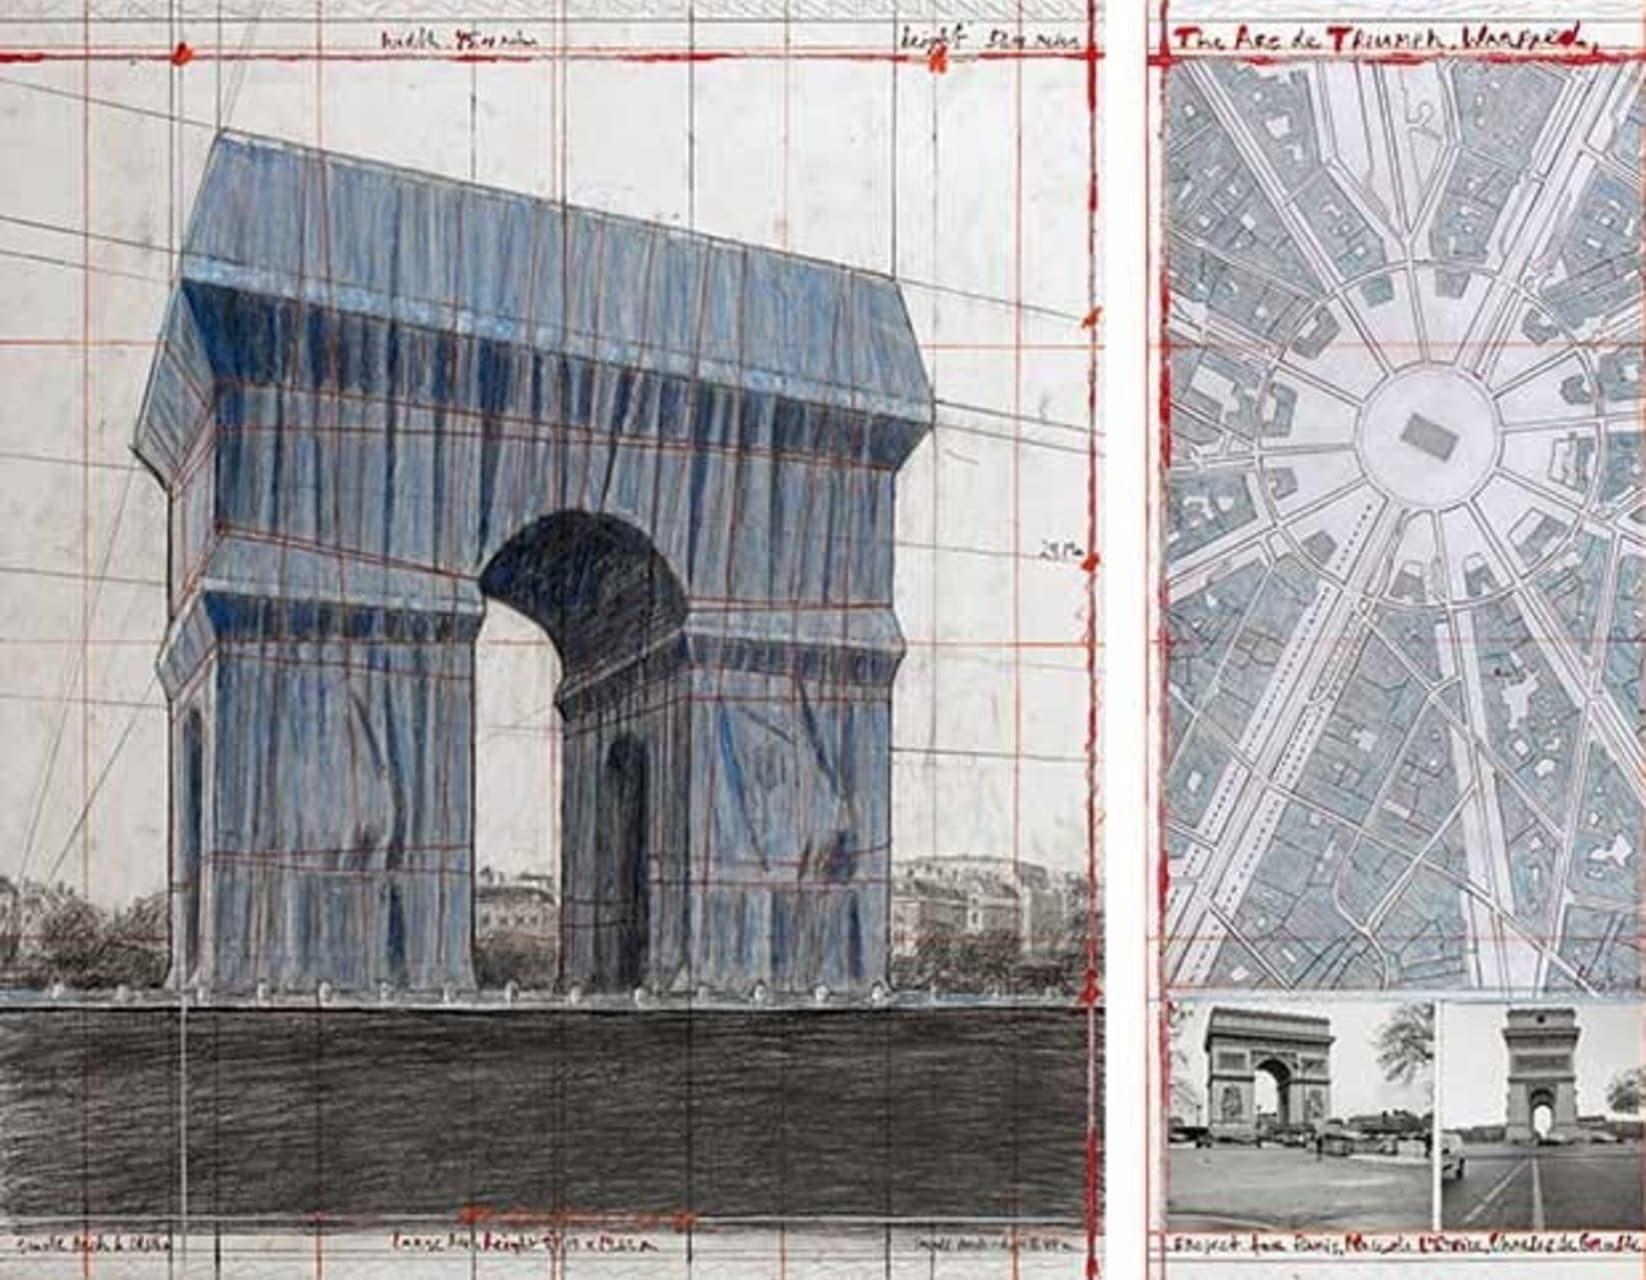 Paris - The Arc de Triomphe Wrapped by Christo